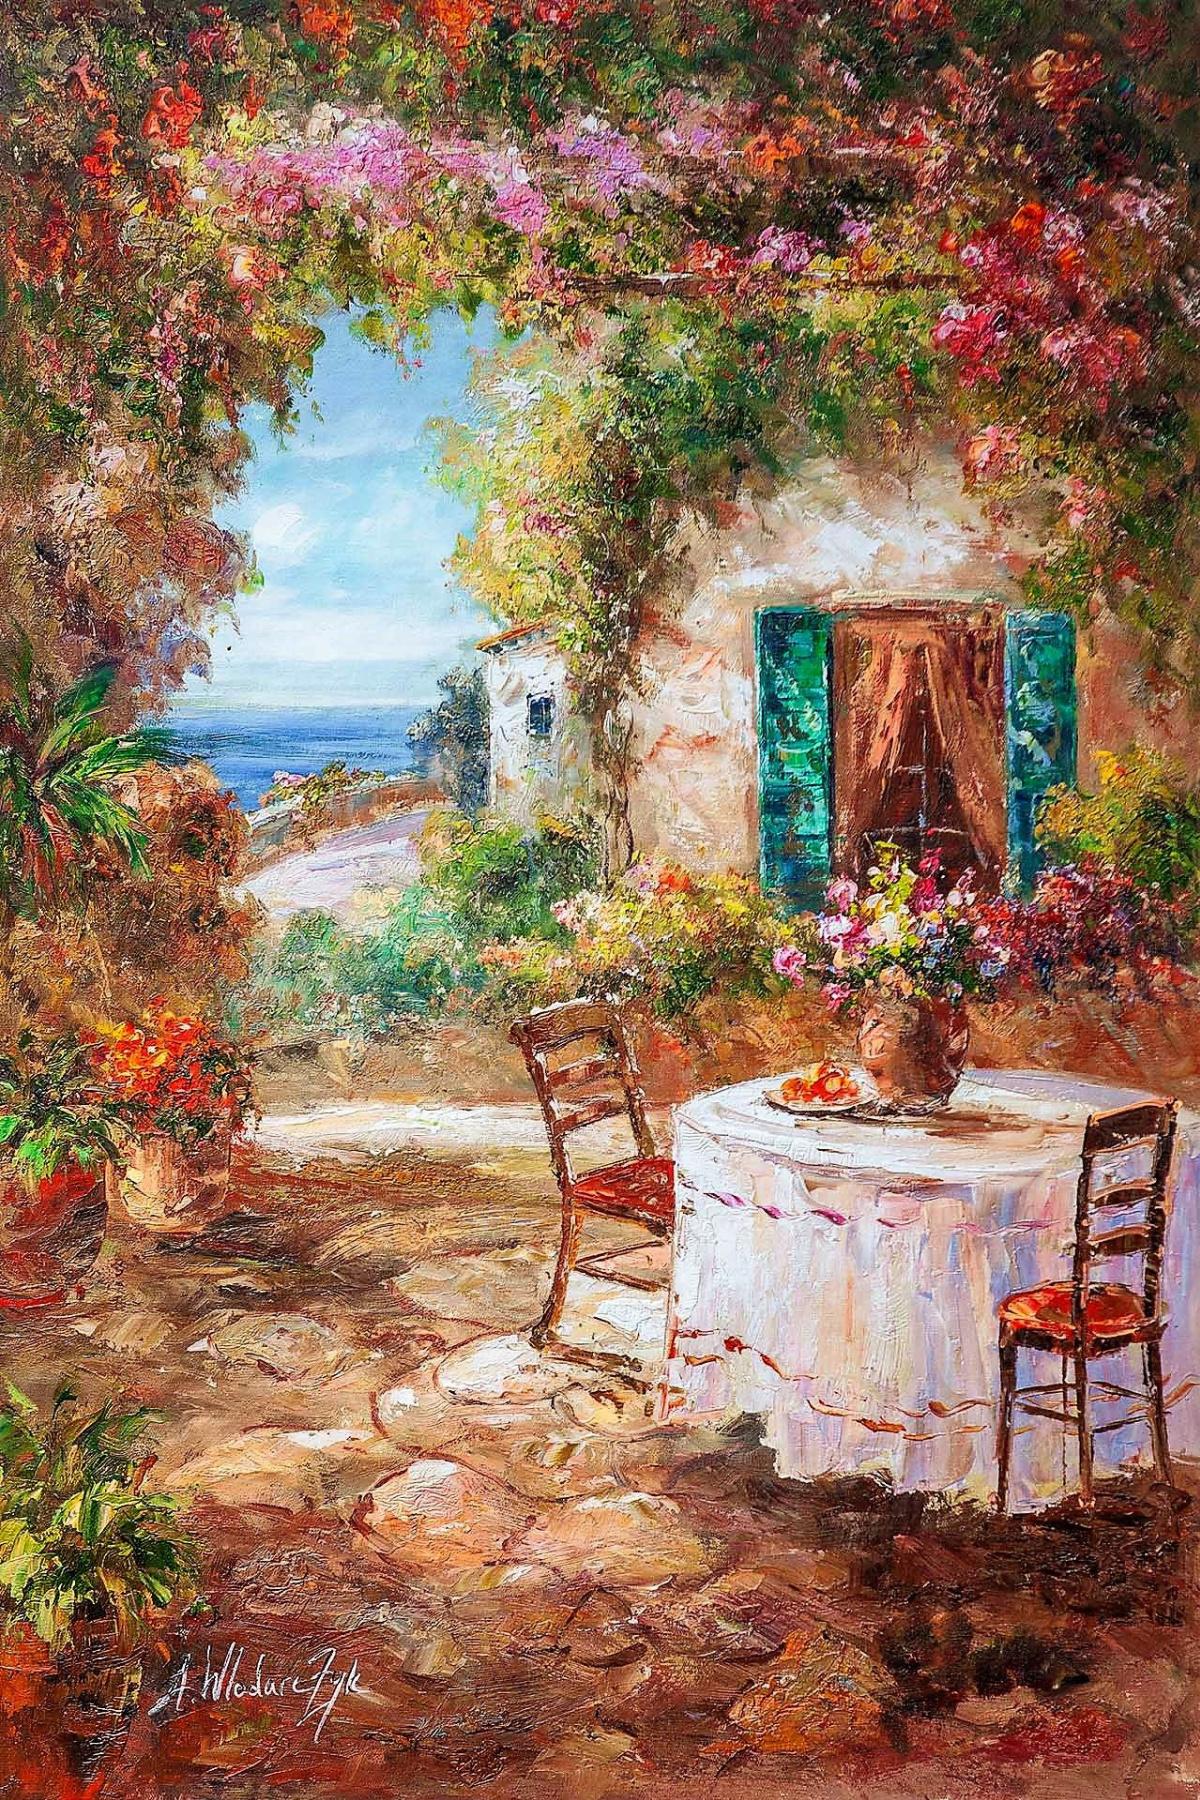 Andrzej Vlodarczyk. In the shadow of flowers N3